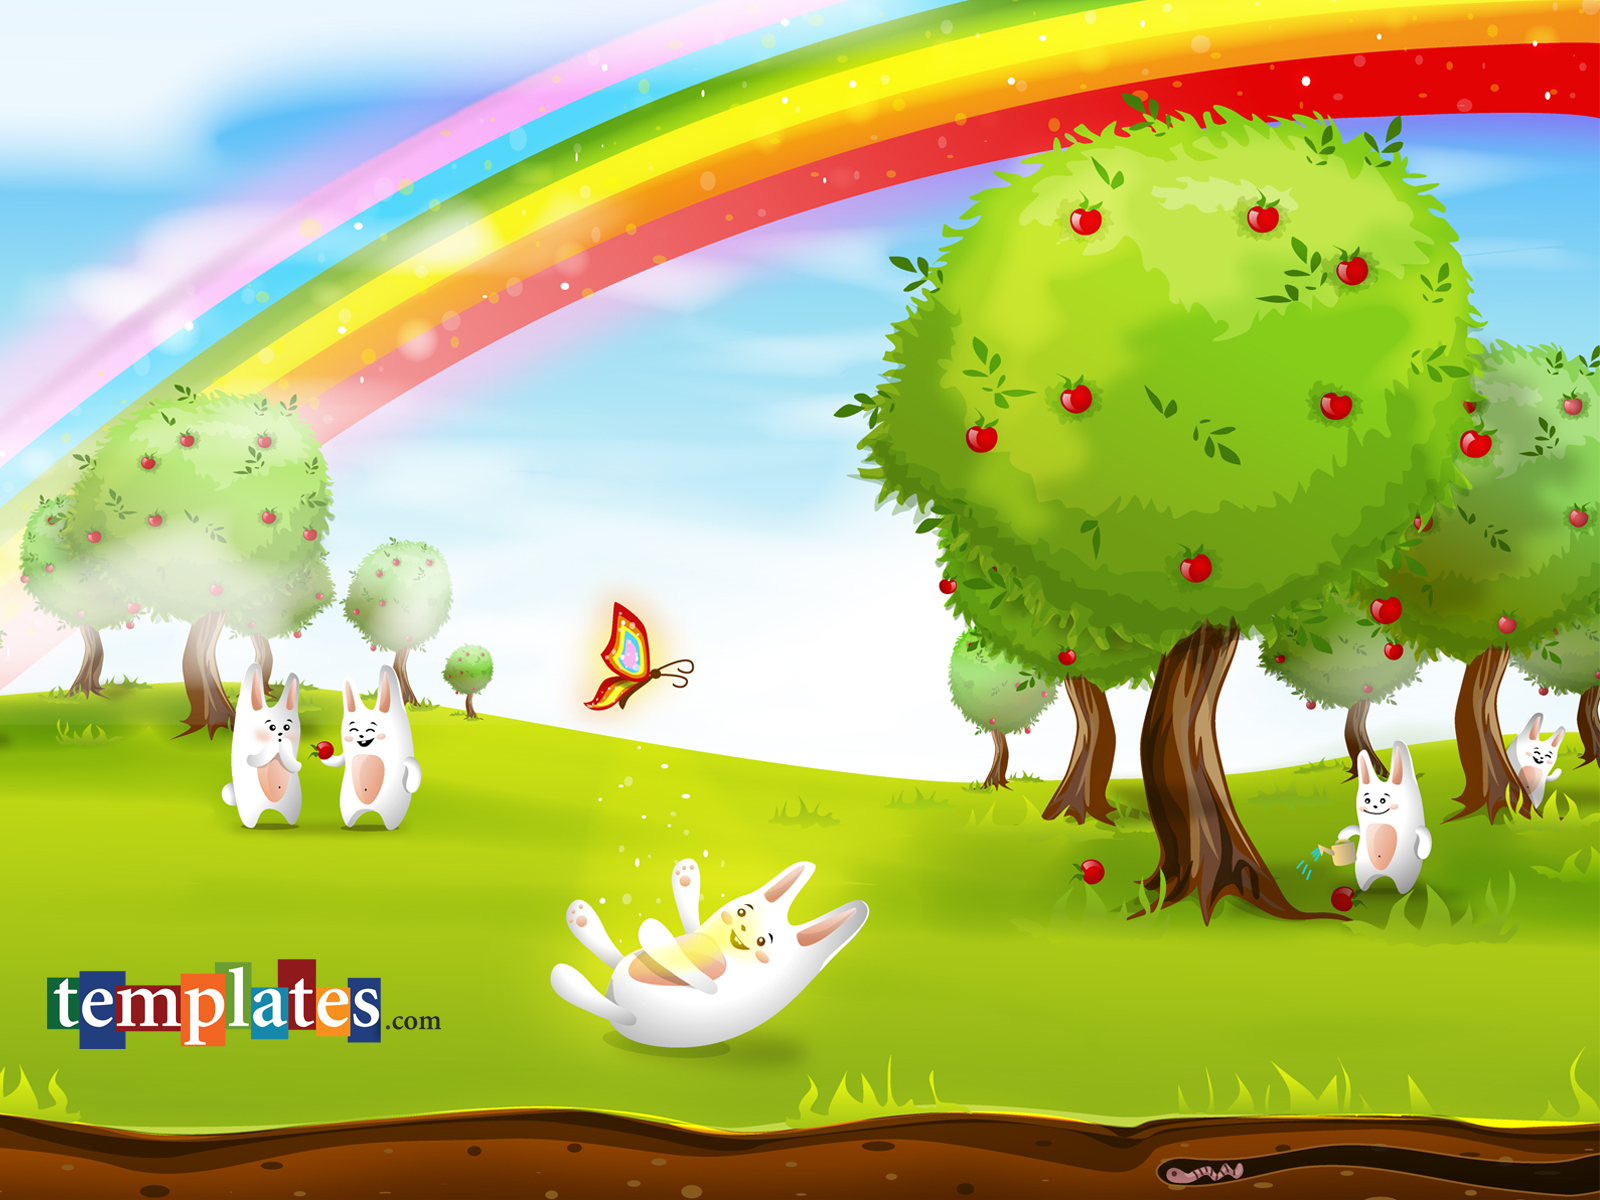 http://3.bp.blogspot.com/-ttVH8uarMmA/TmkmaJQ6-OI/AAAAAAAAFsA/wI_ZOxZIs0Y/s1600/funny+desktop+wallpapers-1.jpg